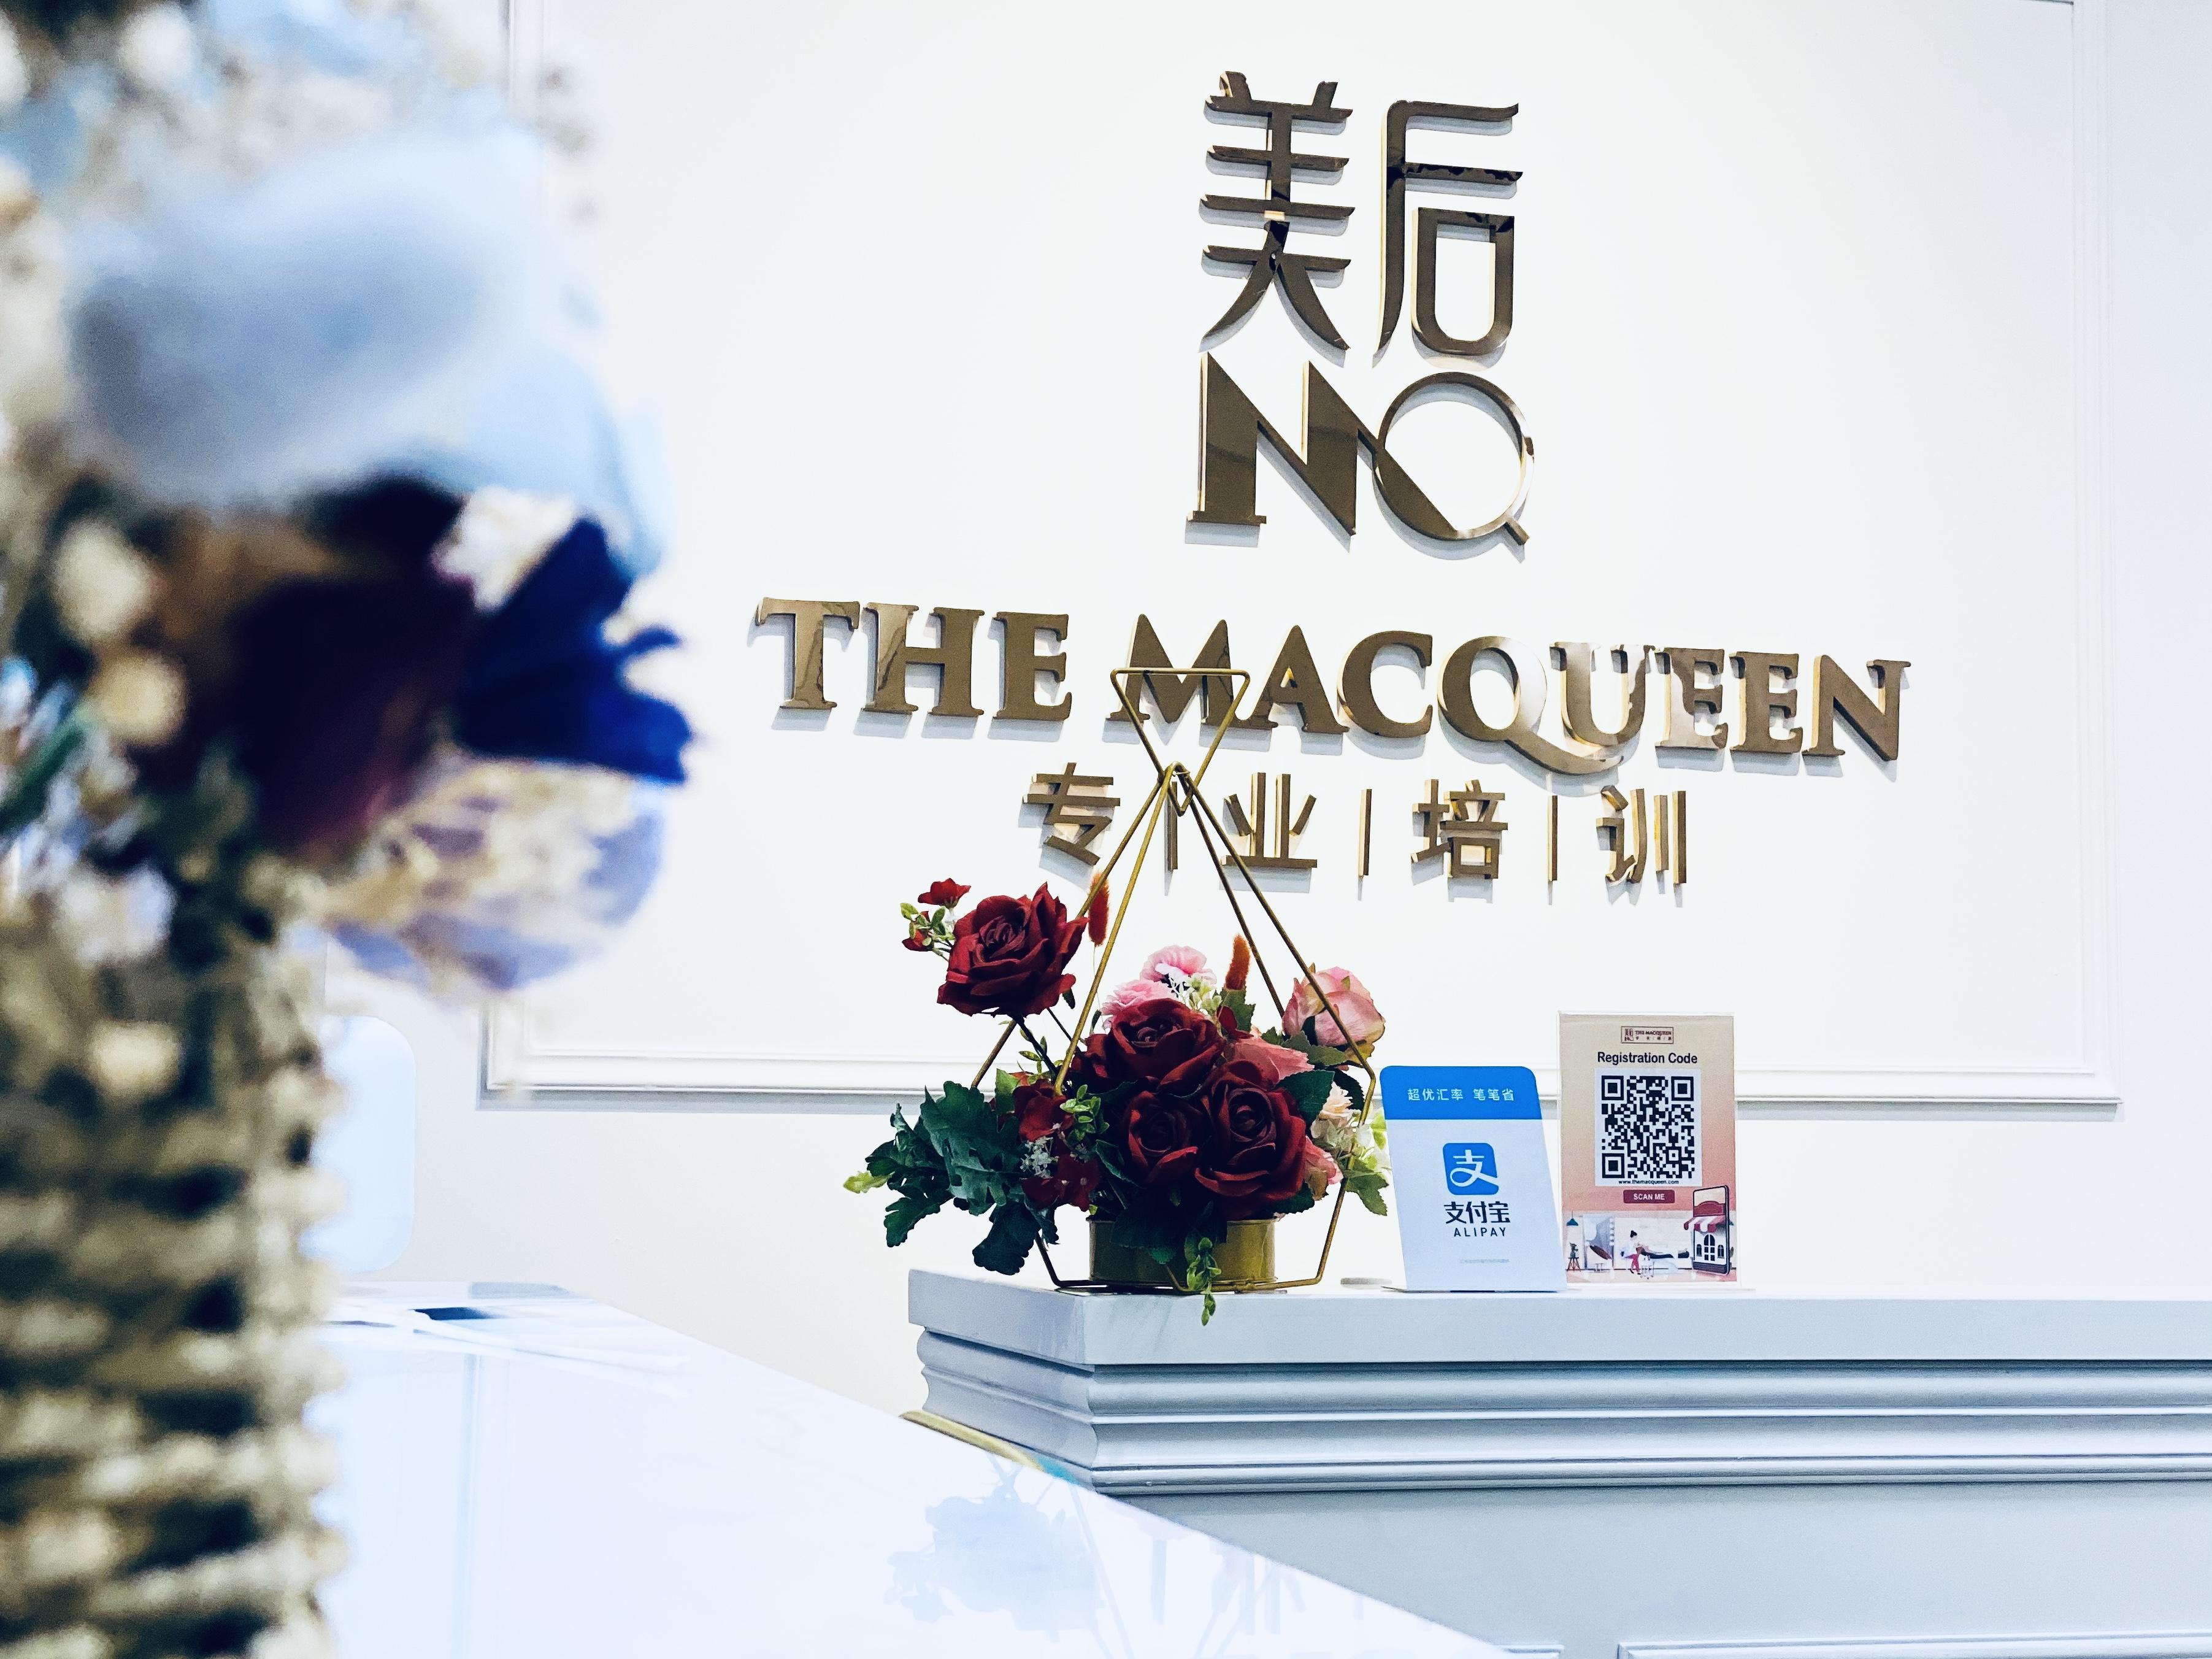 The MacQueen 美后